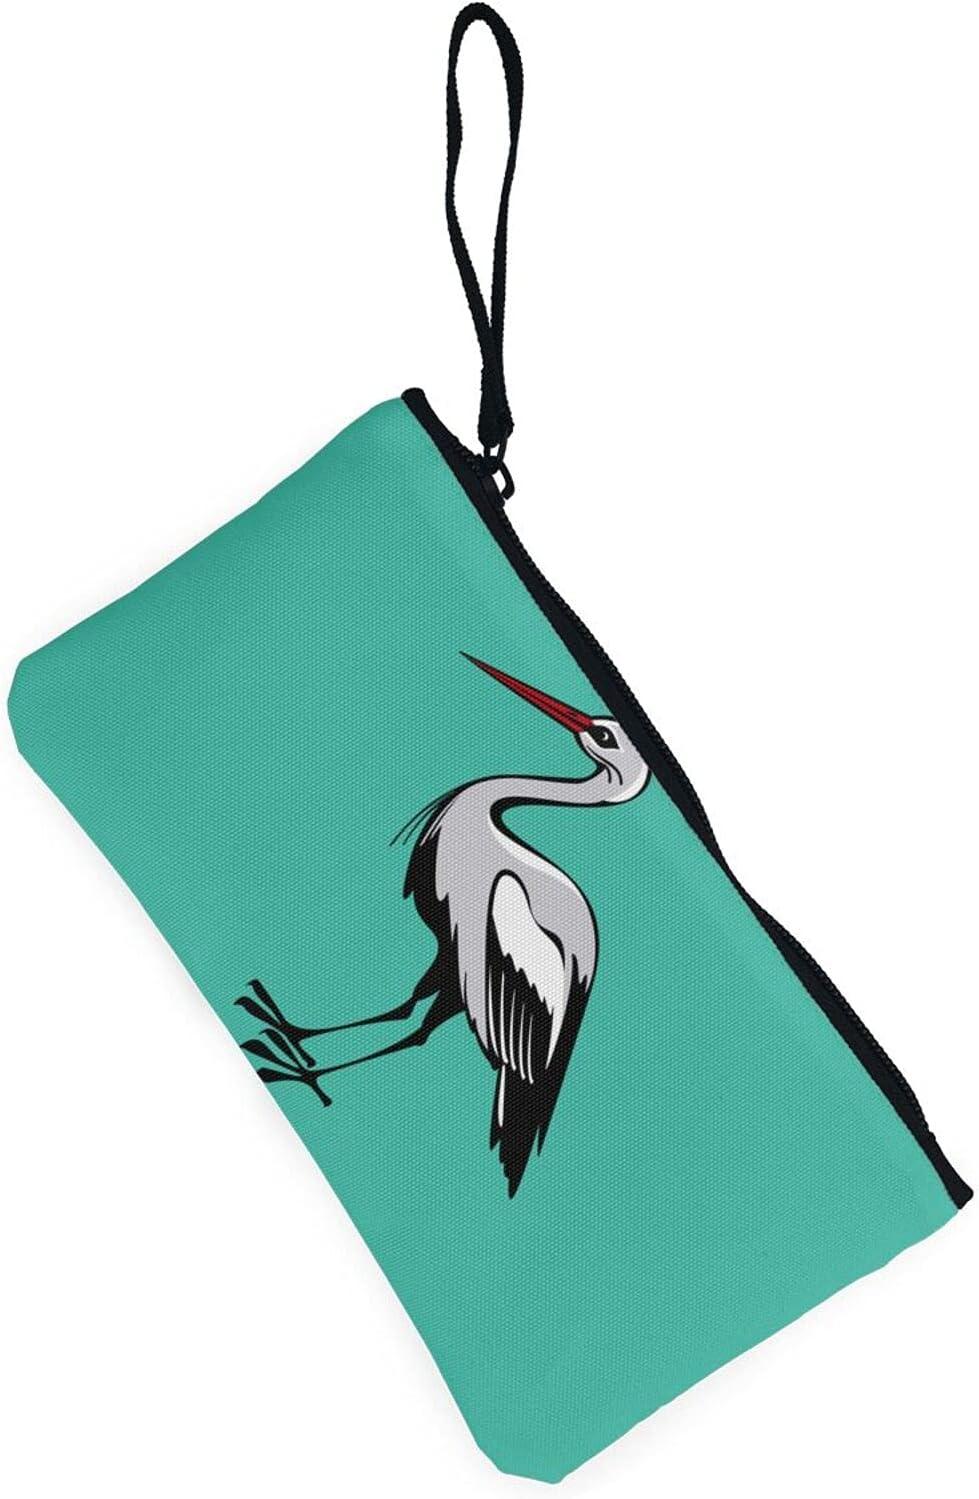 AORRUAM Crane Canvas Coin Purse,Canvas Zipper Pencil Cases,Canvas Change Purse Pouch Mini Wallet Coin Bag